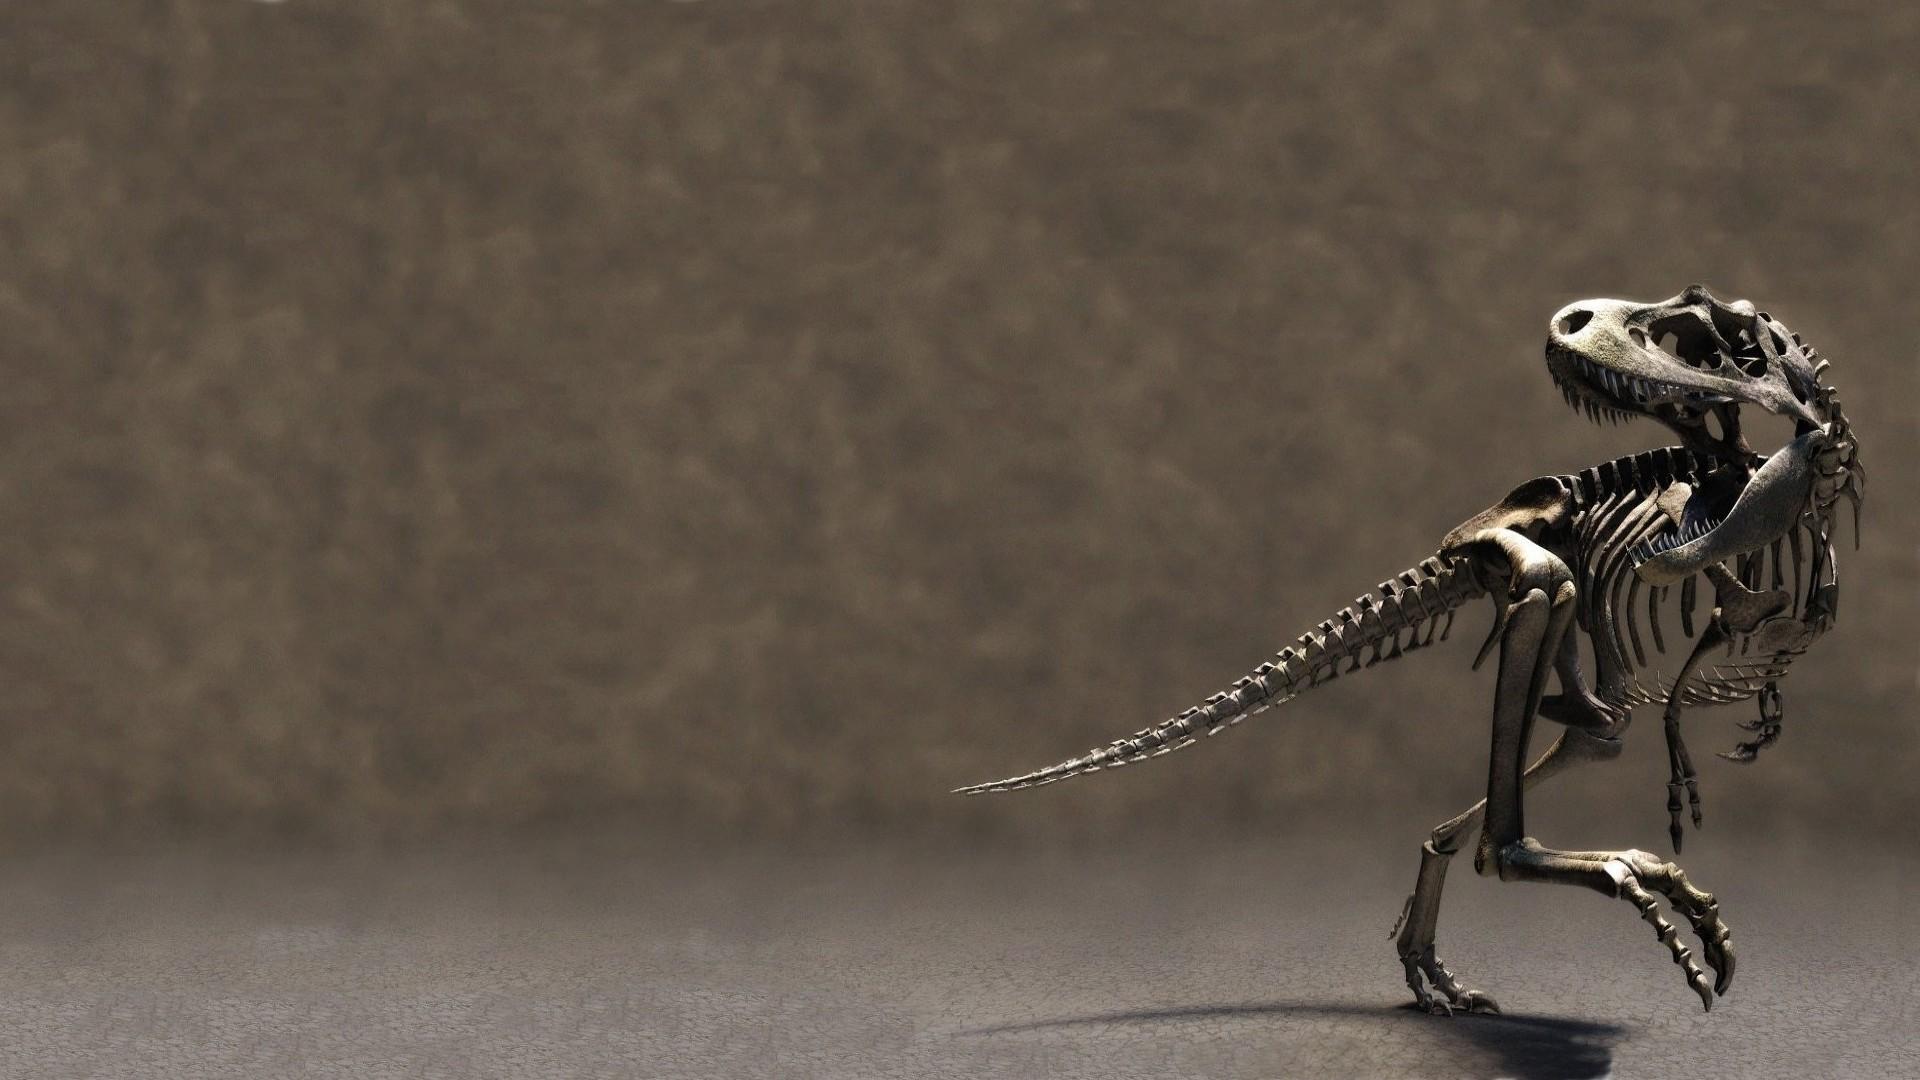 Velociraptor Wallpapers ①